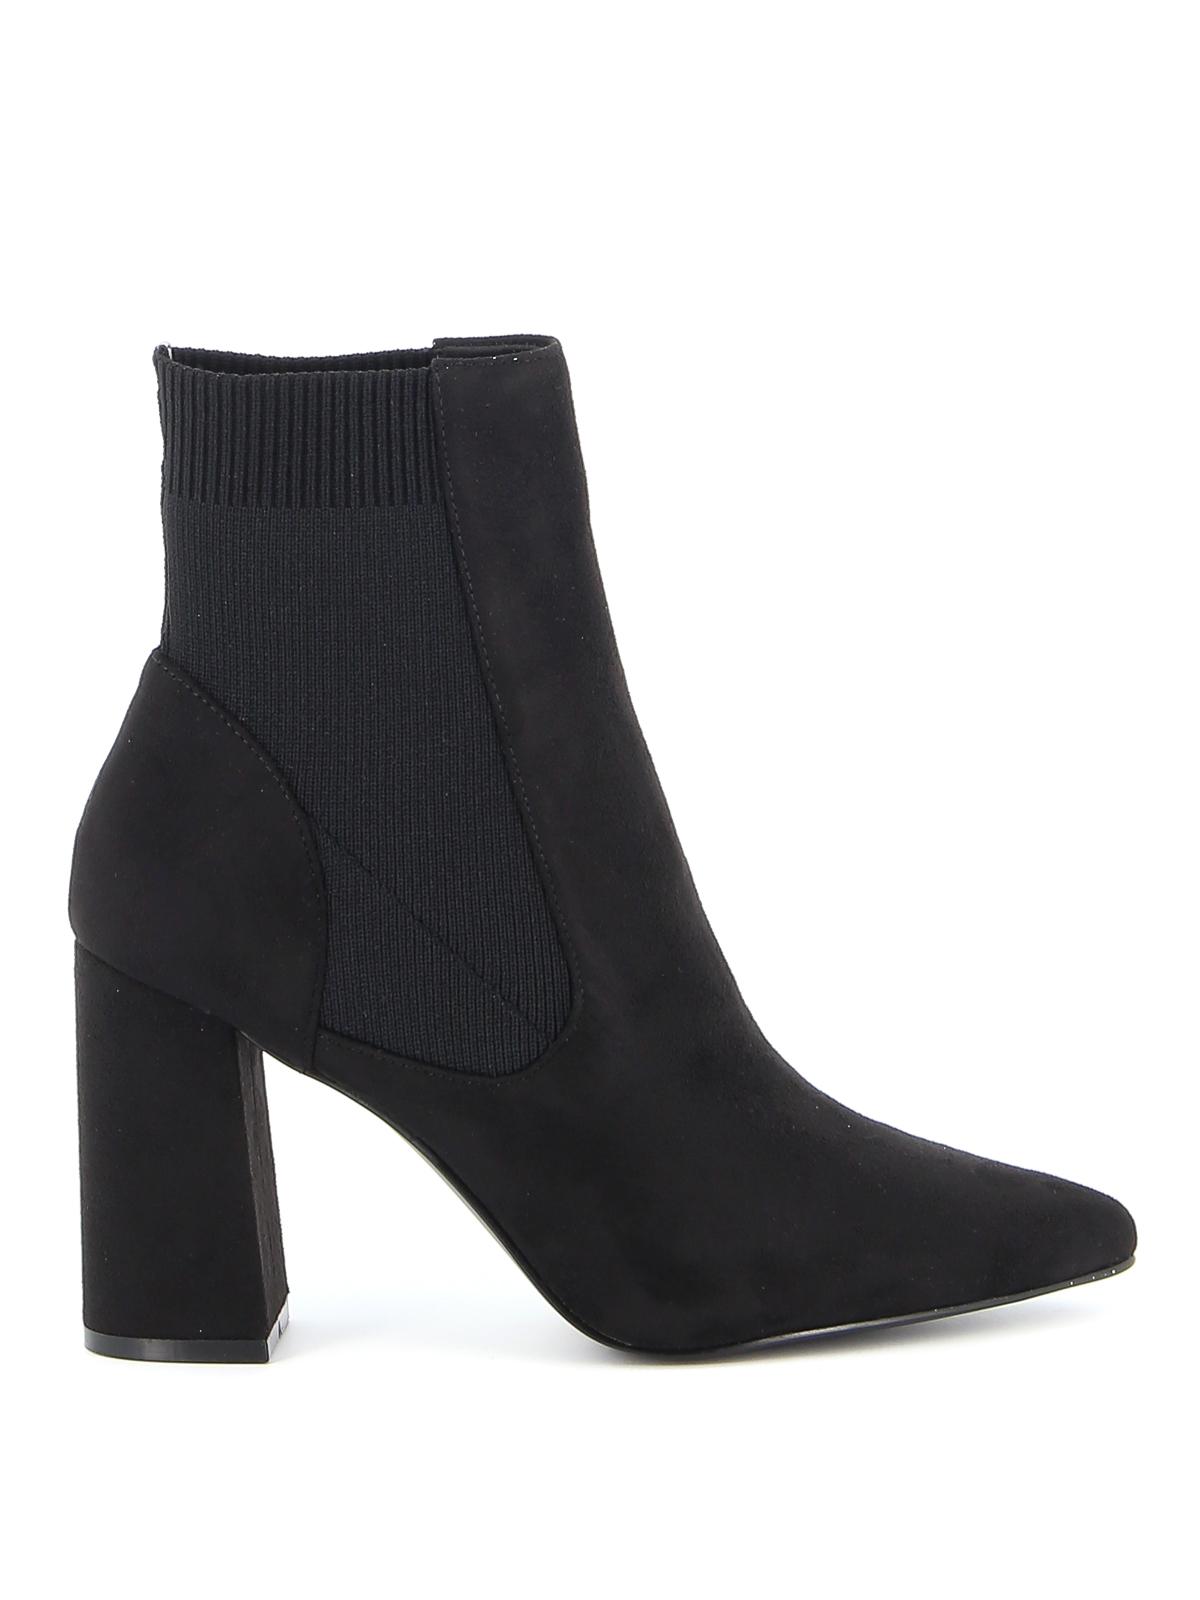 Steve Madden - Reesa ankle boots